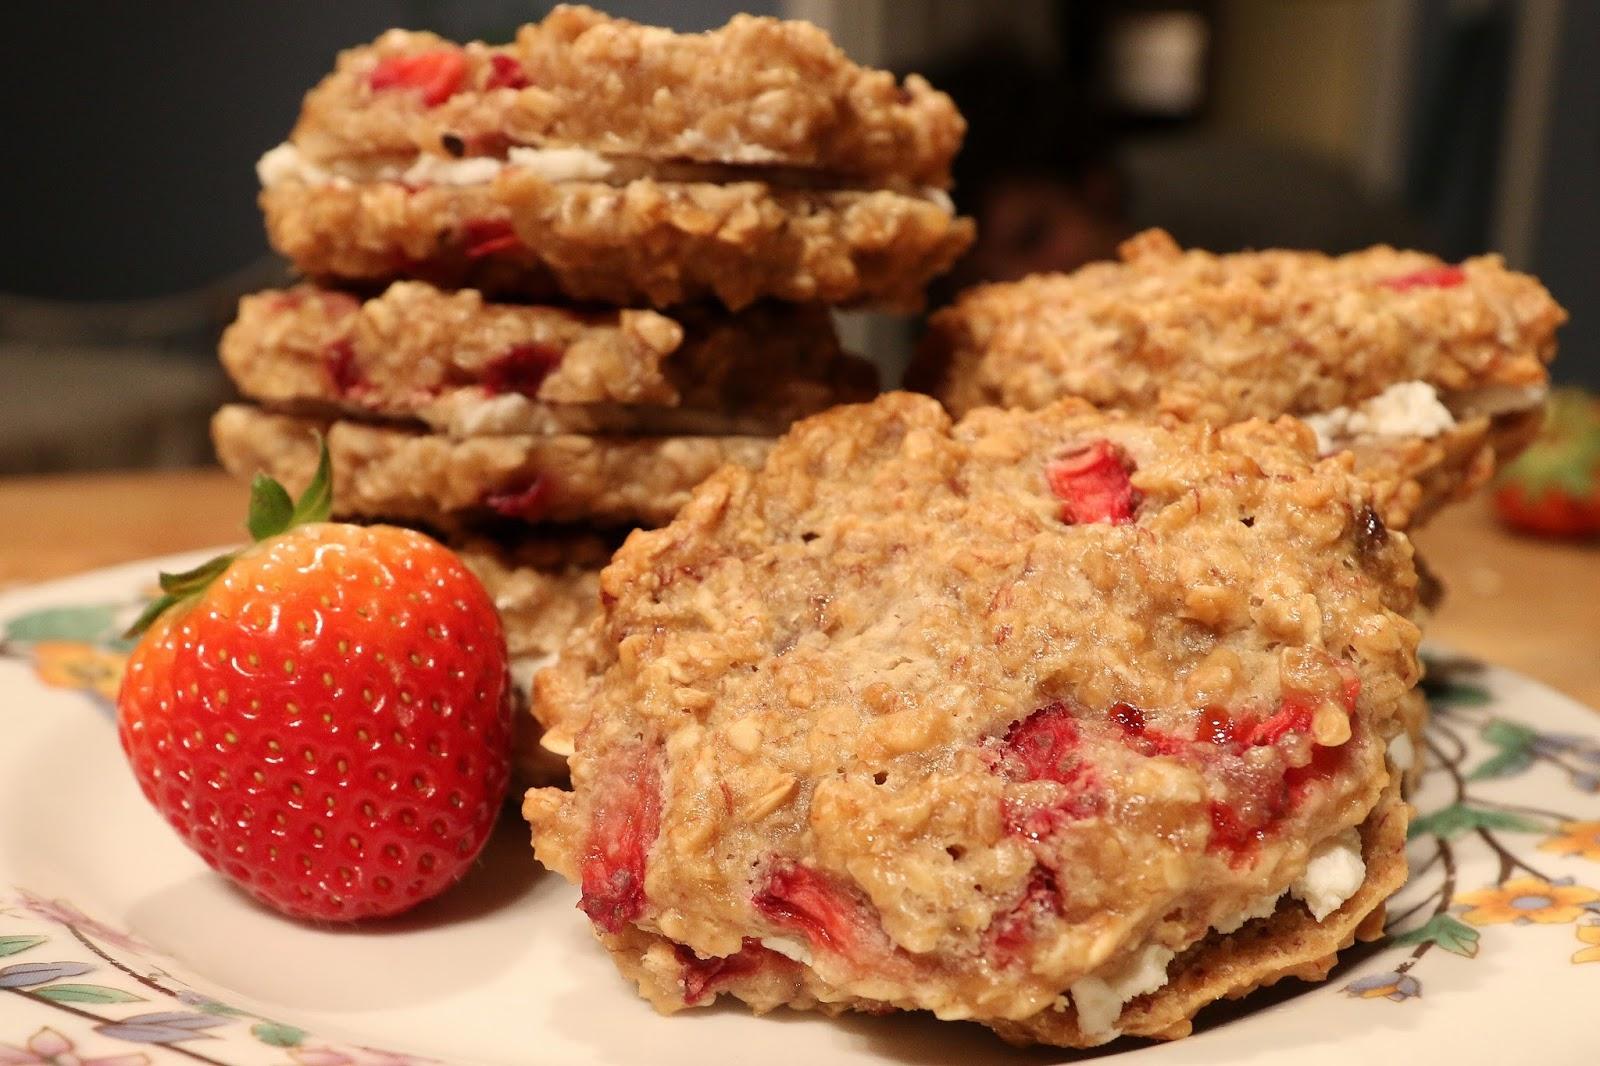 Accidental Cream Pie Beautiful blackberry morning: strawberry oatmeal cream pies (low sugar)